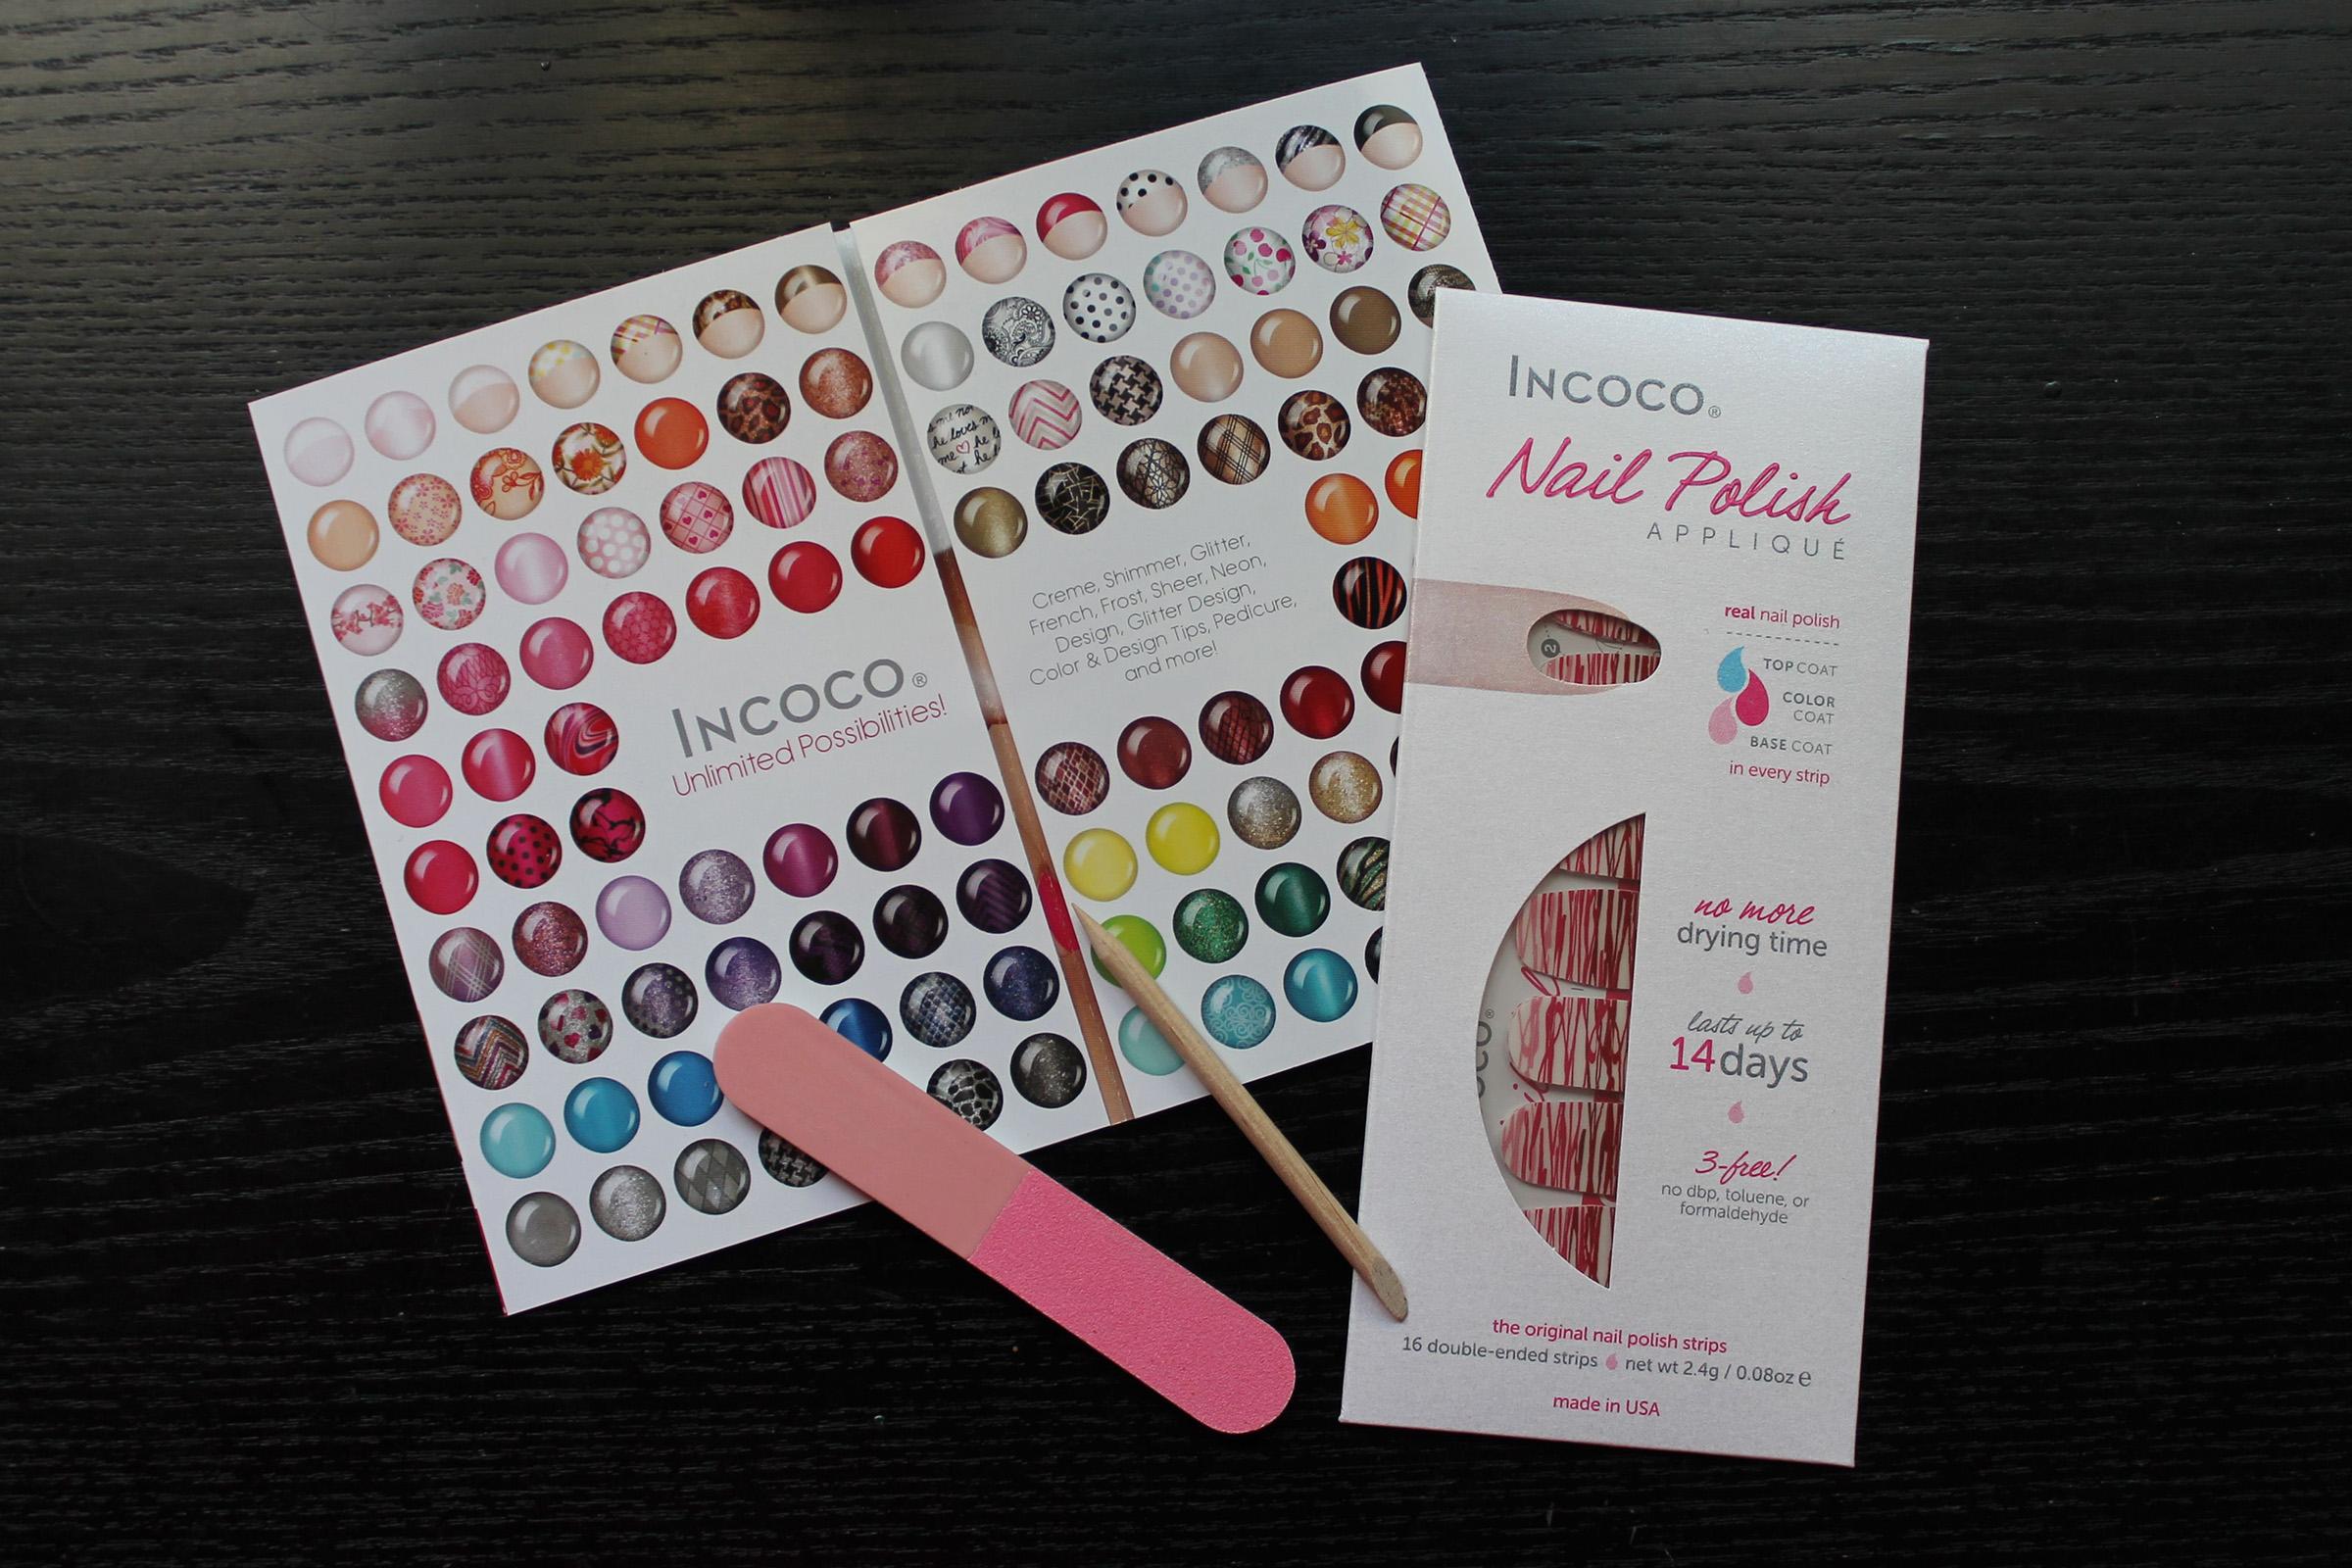 Incoco Nail Polish Appliqués